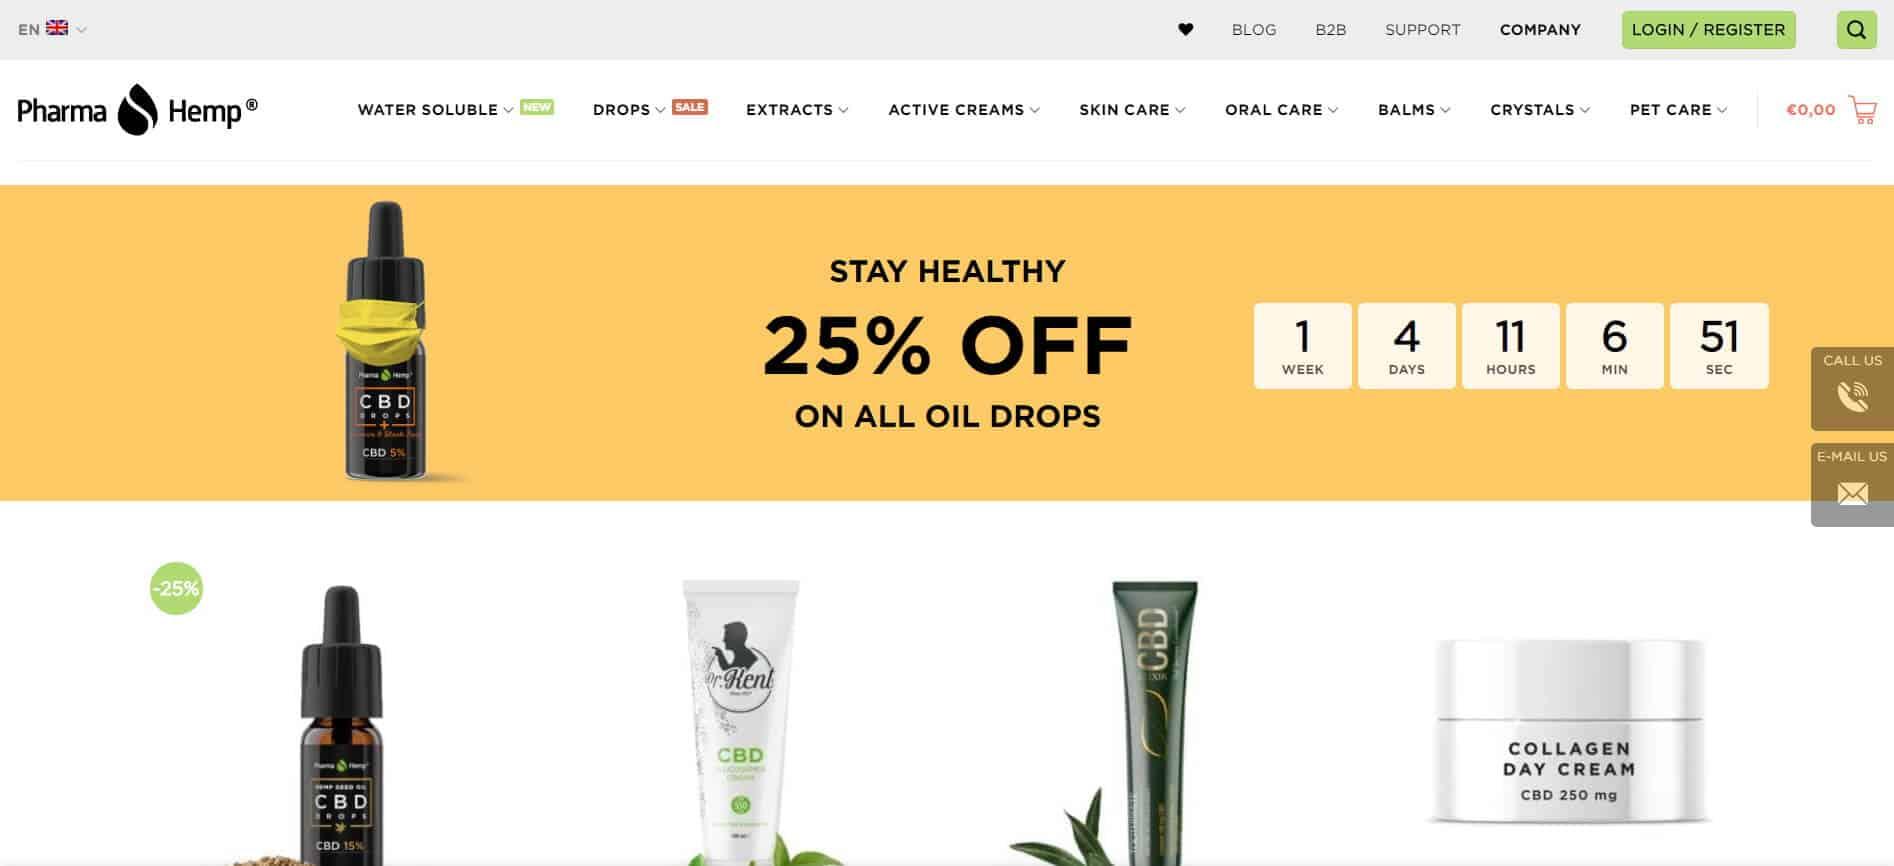 Boutique PharmaHemp